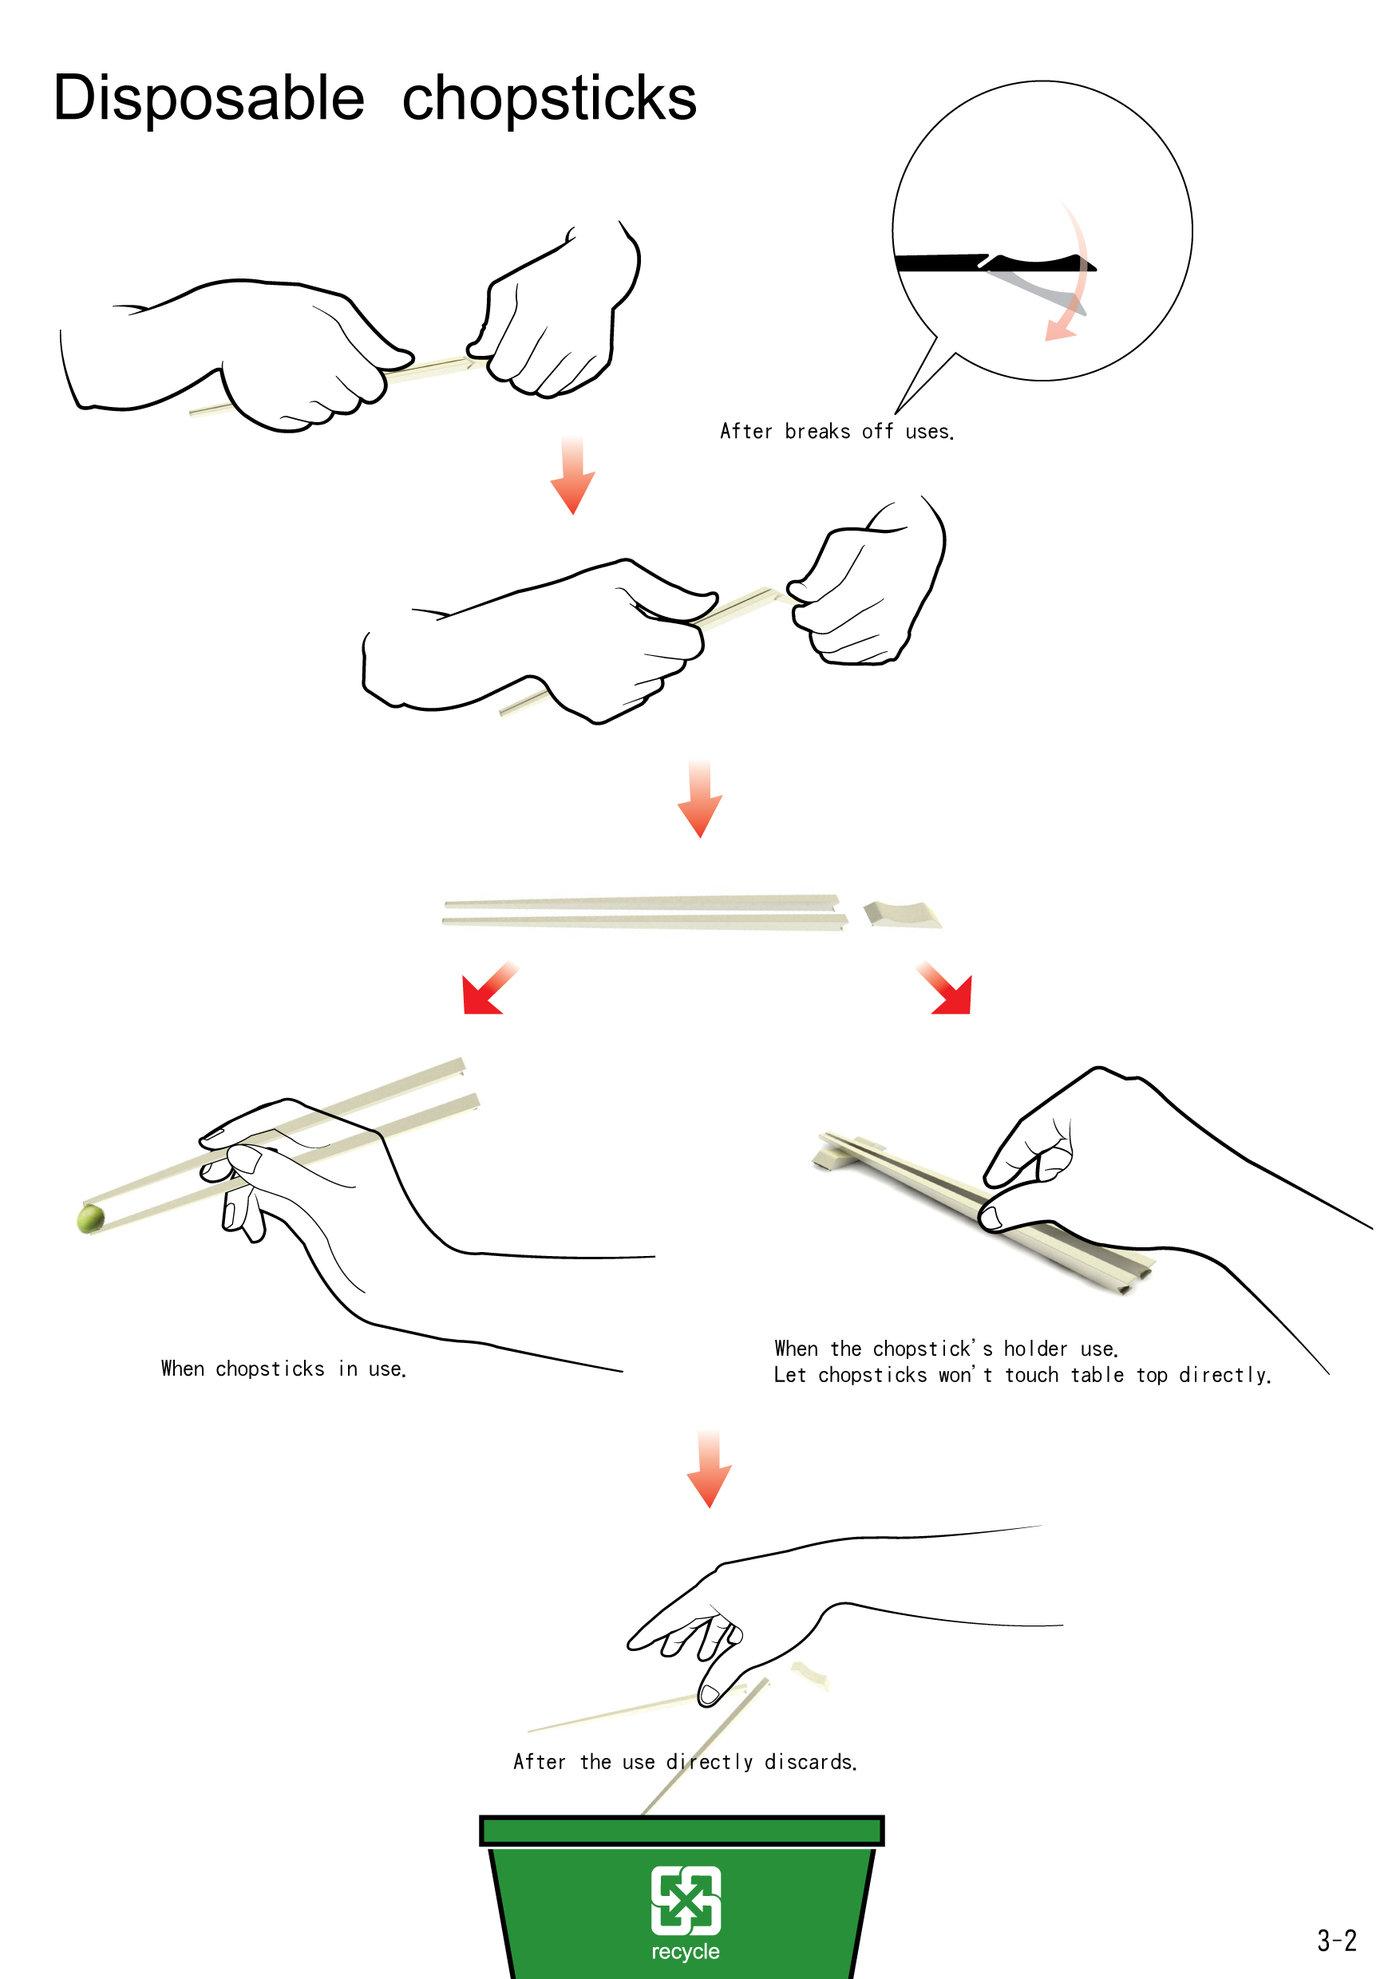 Disposable chopsticks by Liu Yao Sheng at Coroflot.com